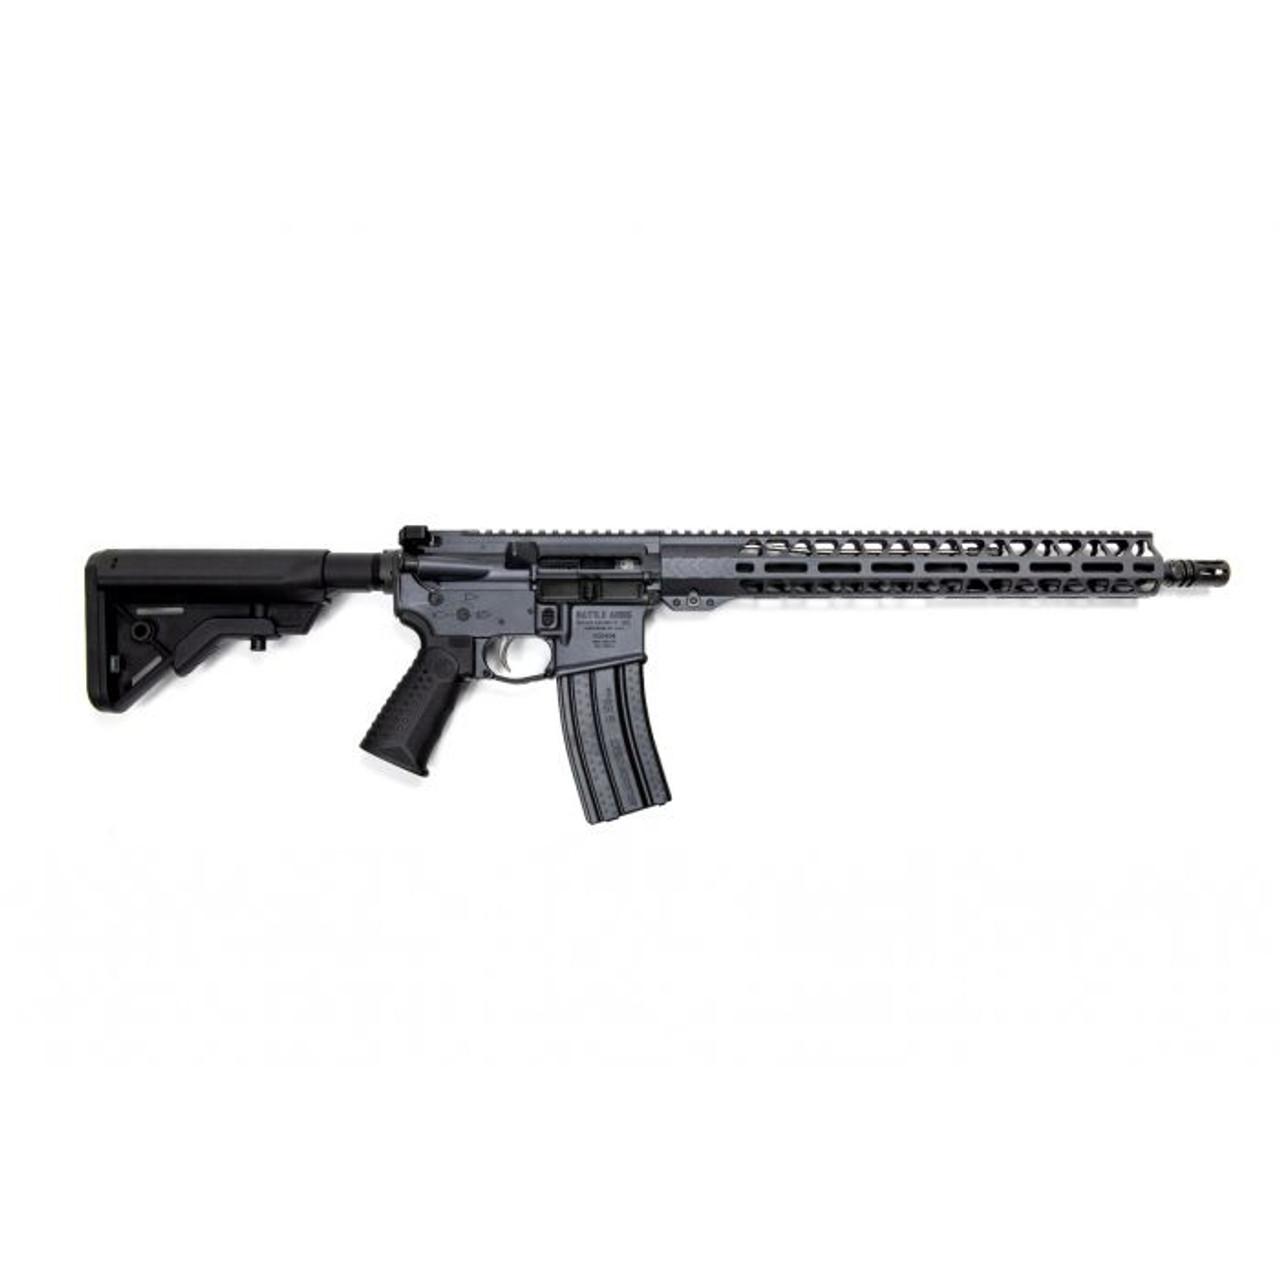 Battle Arms Development Workhorse CALIFORNIA LEGAL -.223/ 5.56